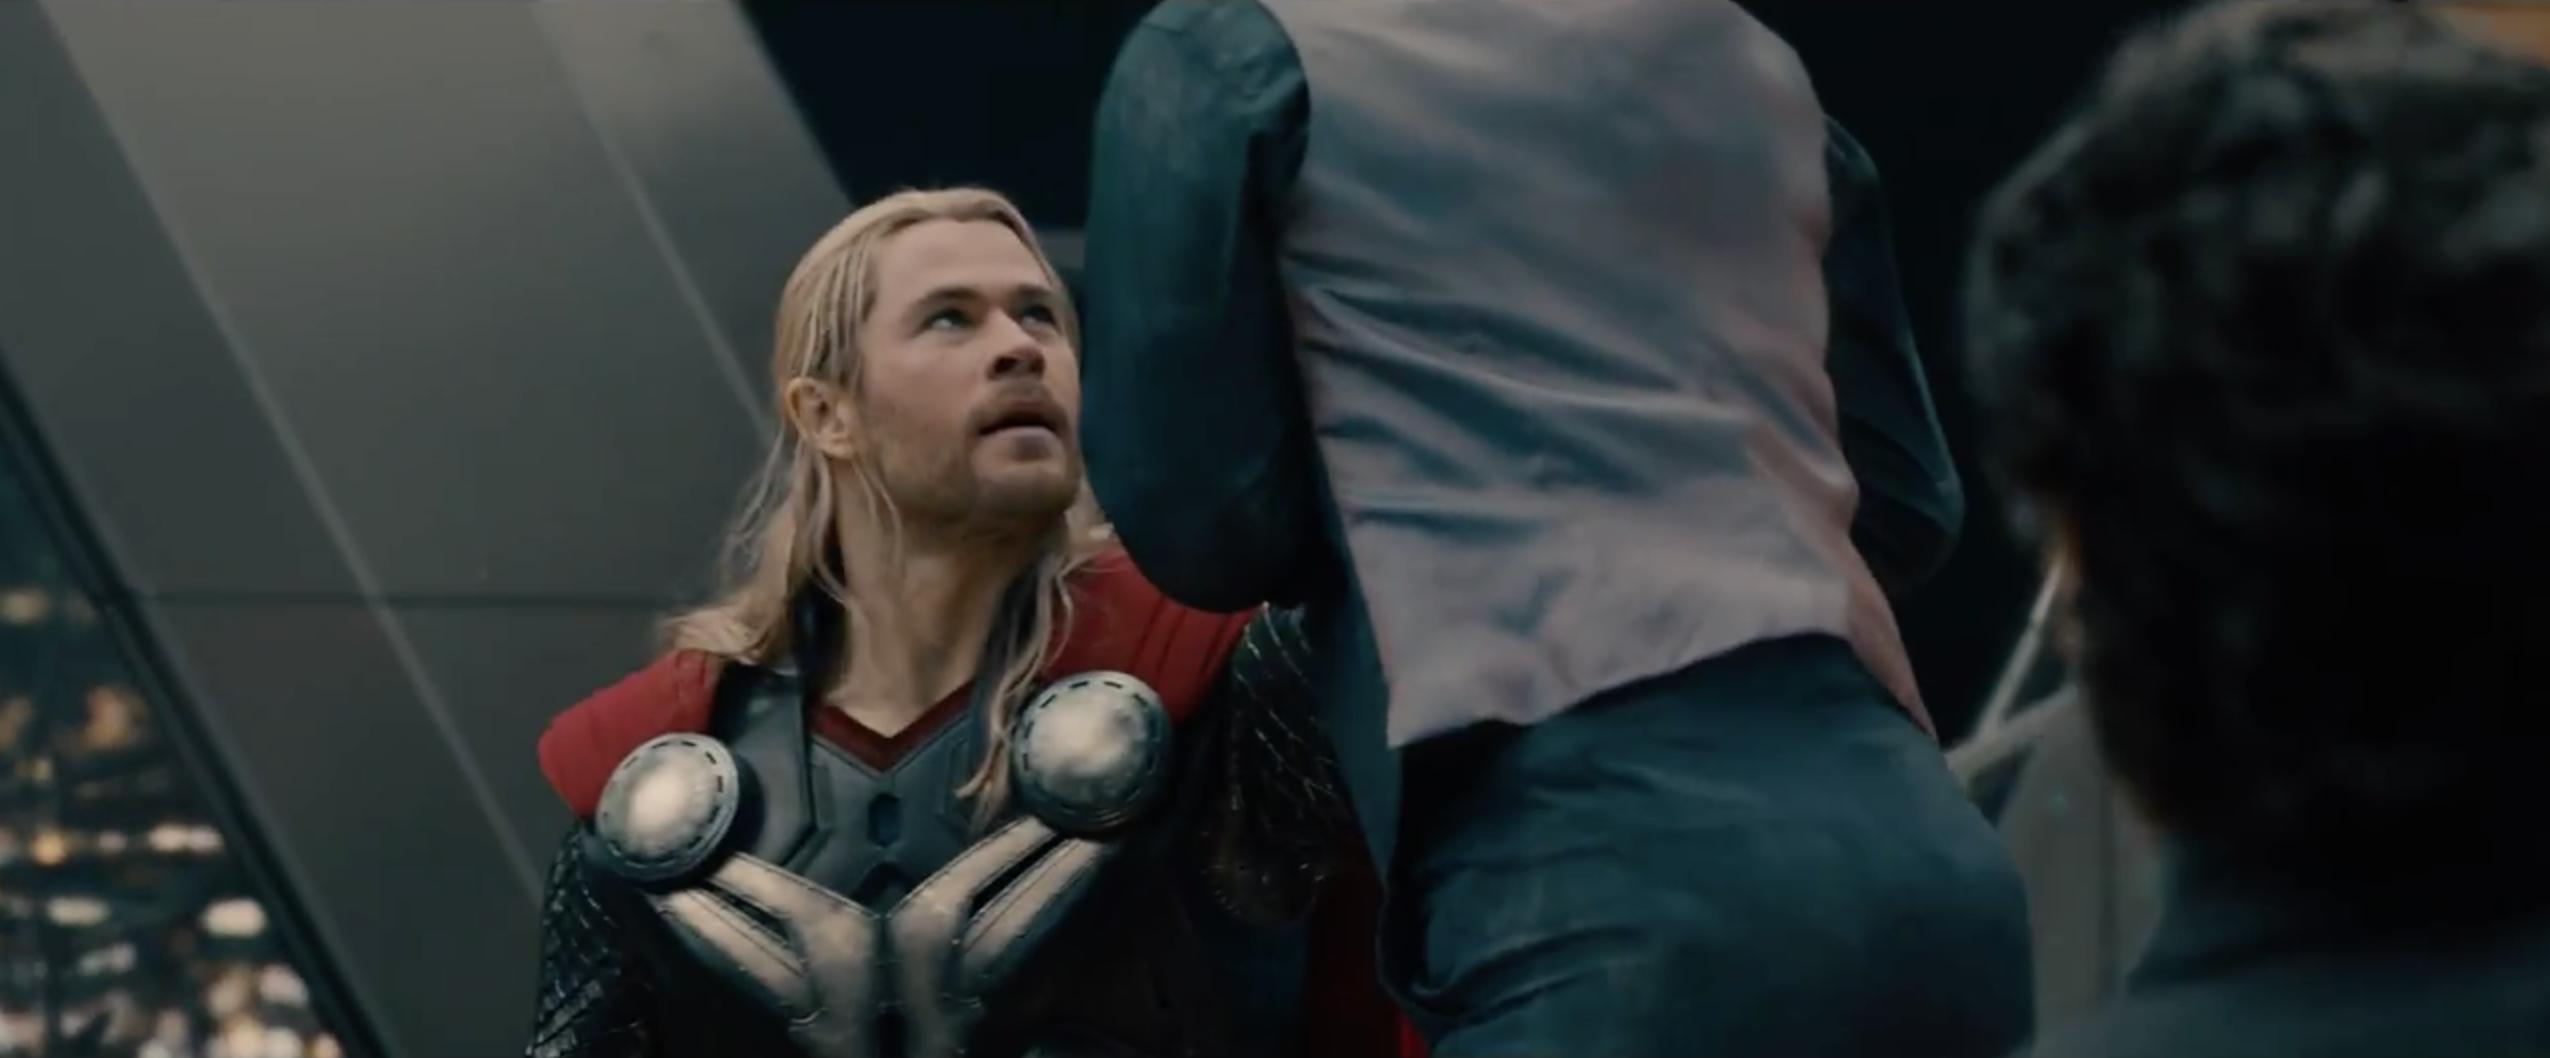 Avengers: Age of Ultron - Thor contro Tony Stark dal full trailer del film